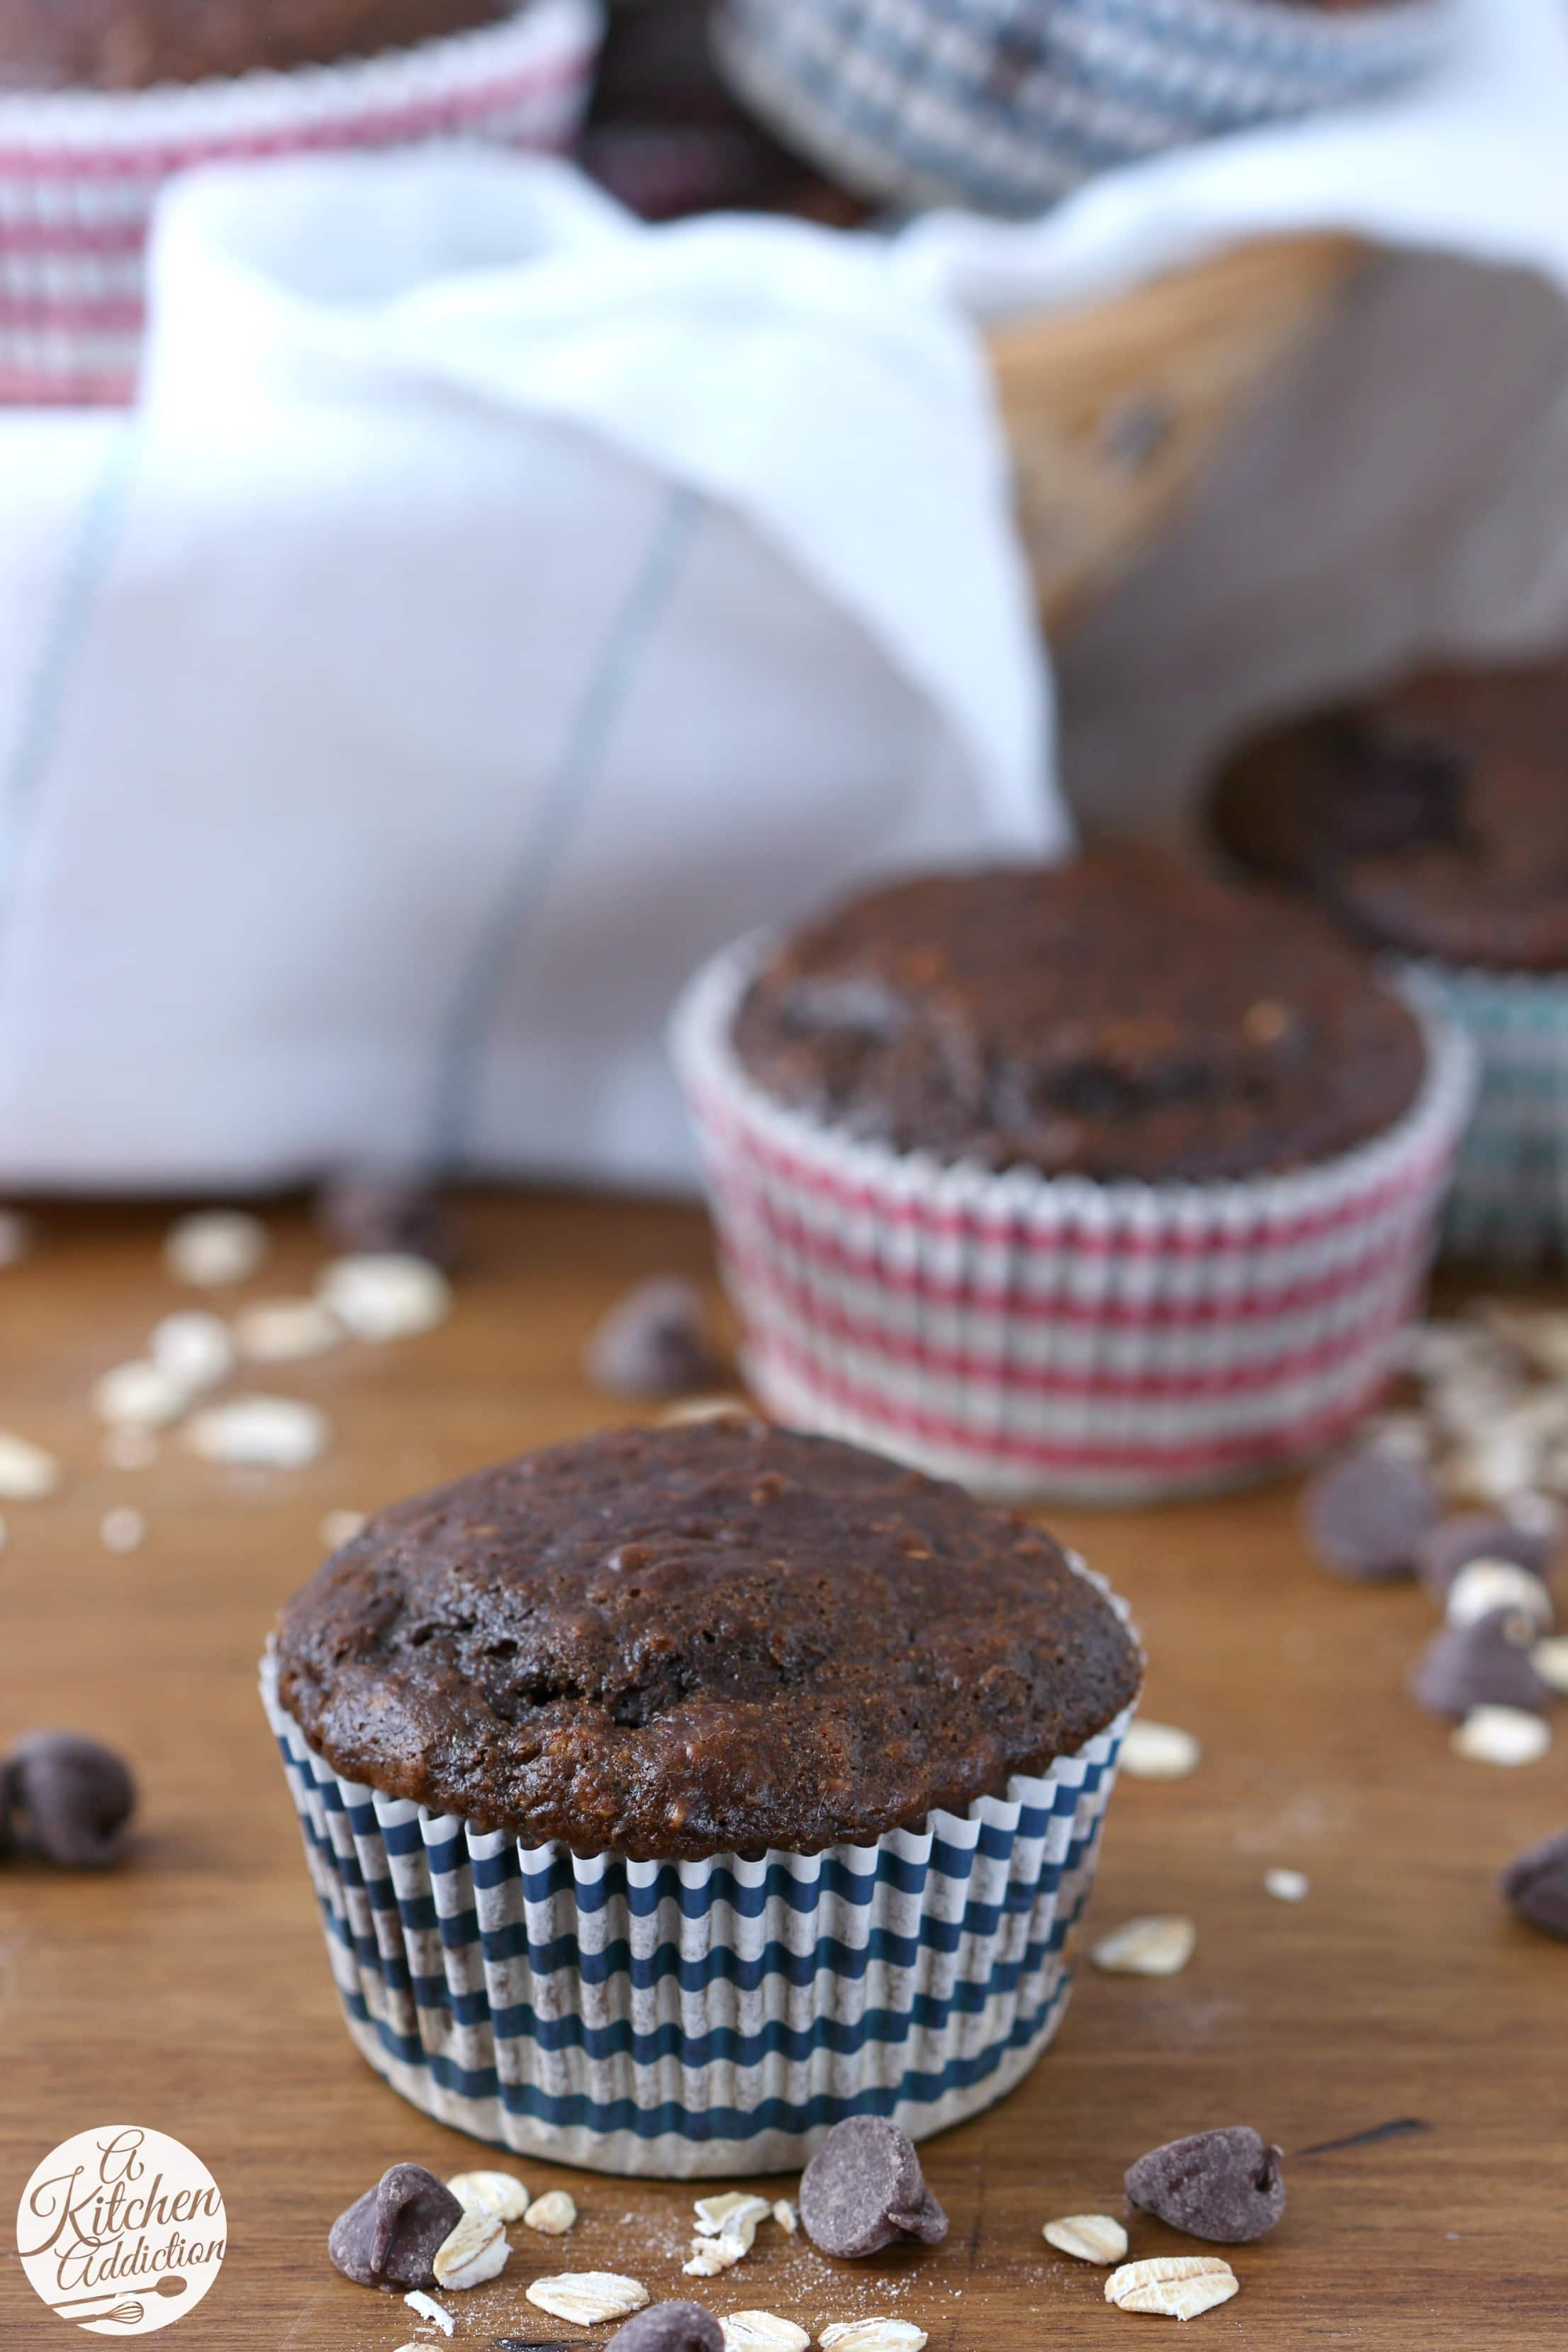 Skinny Double Chocolate Yogurt Oat Muffins Recipe from A Kitchen Addiction